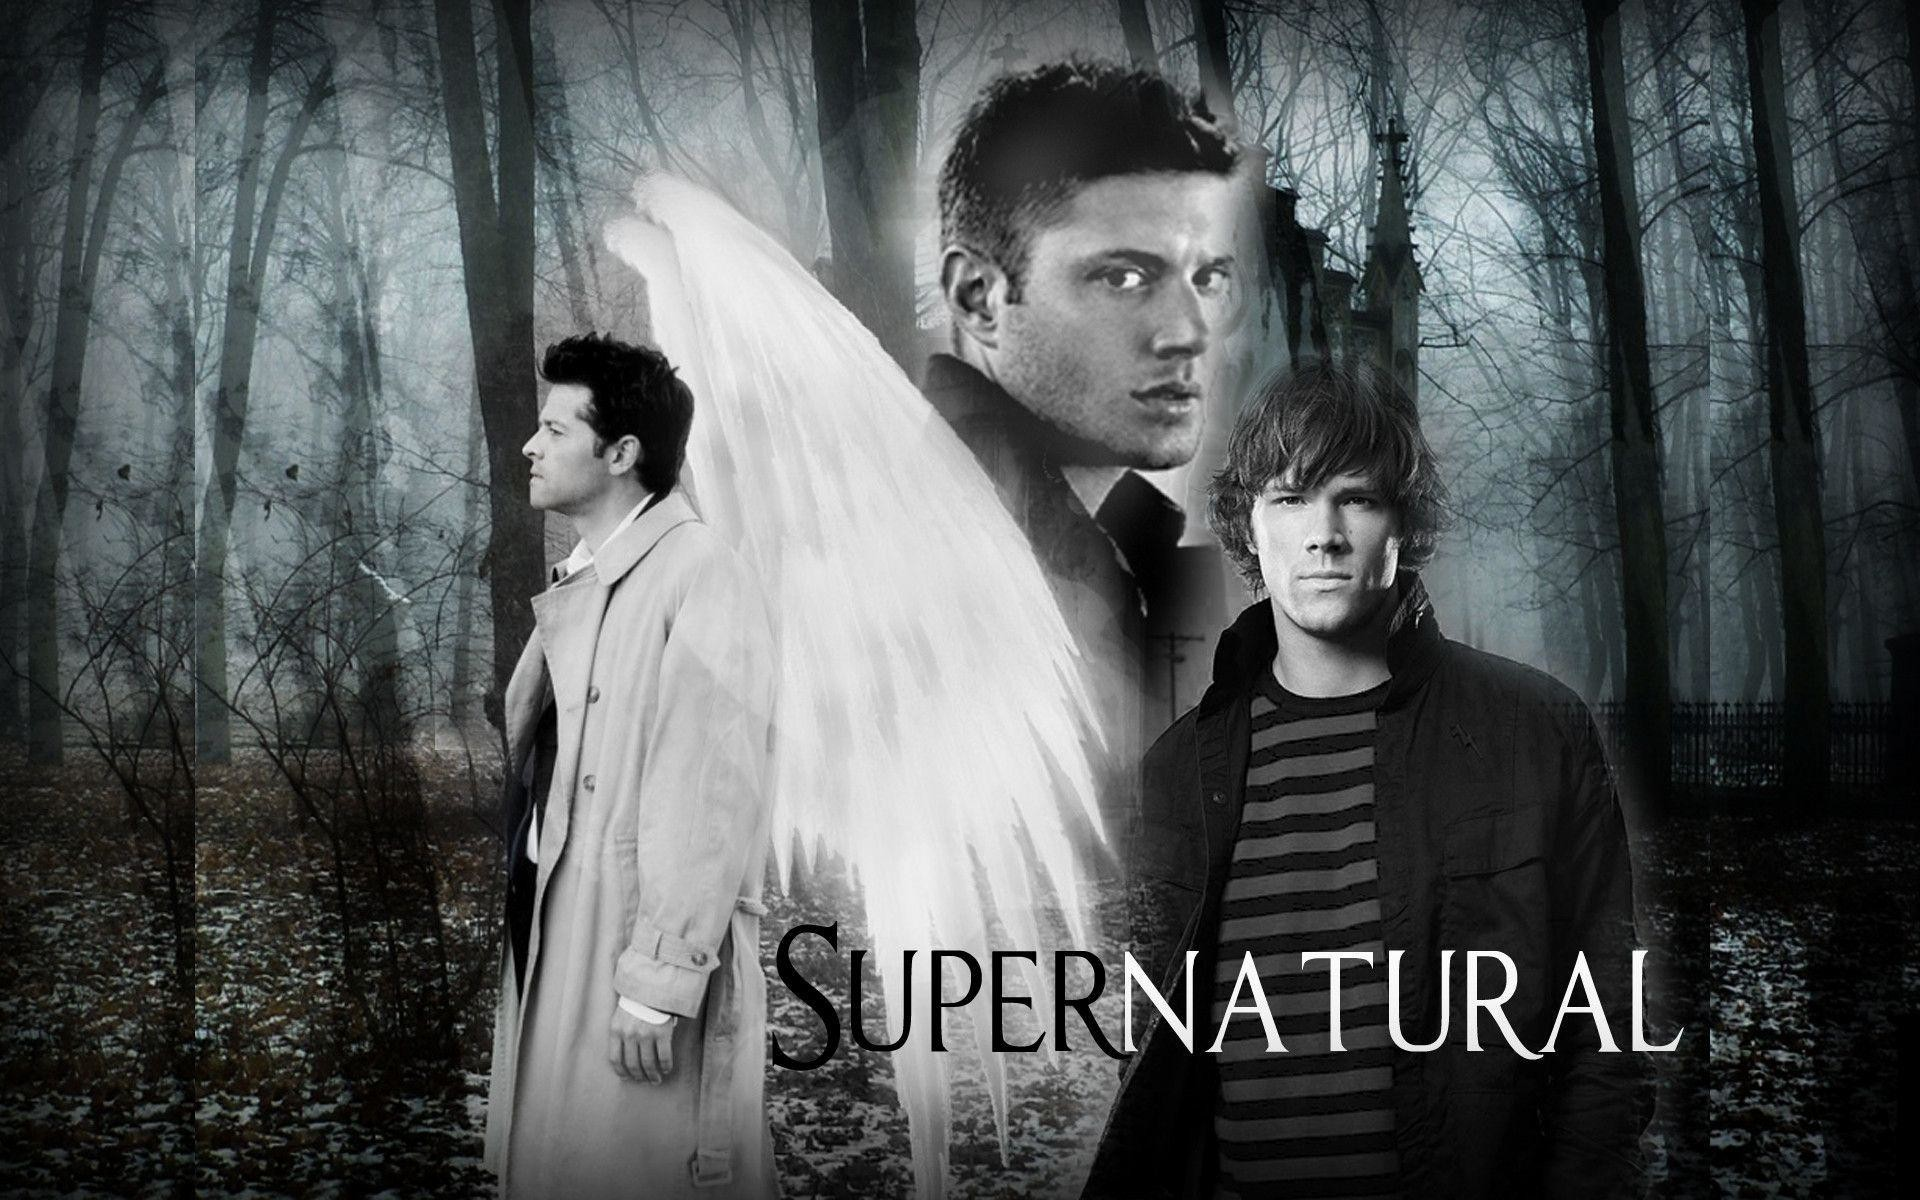 Free-Castiel-Supernatural-Iphone-Background-Download